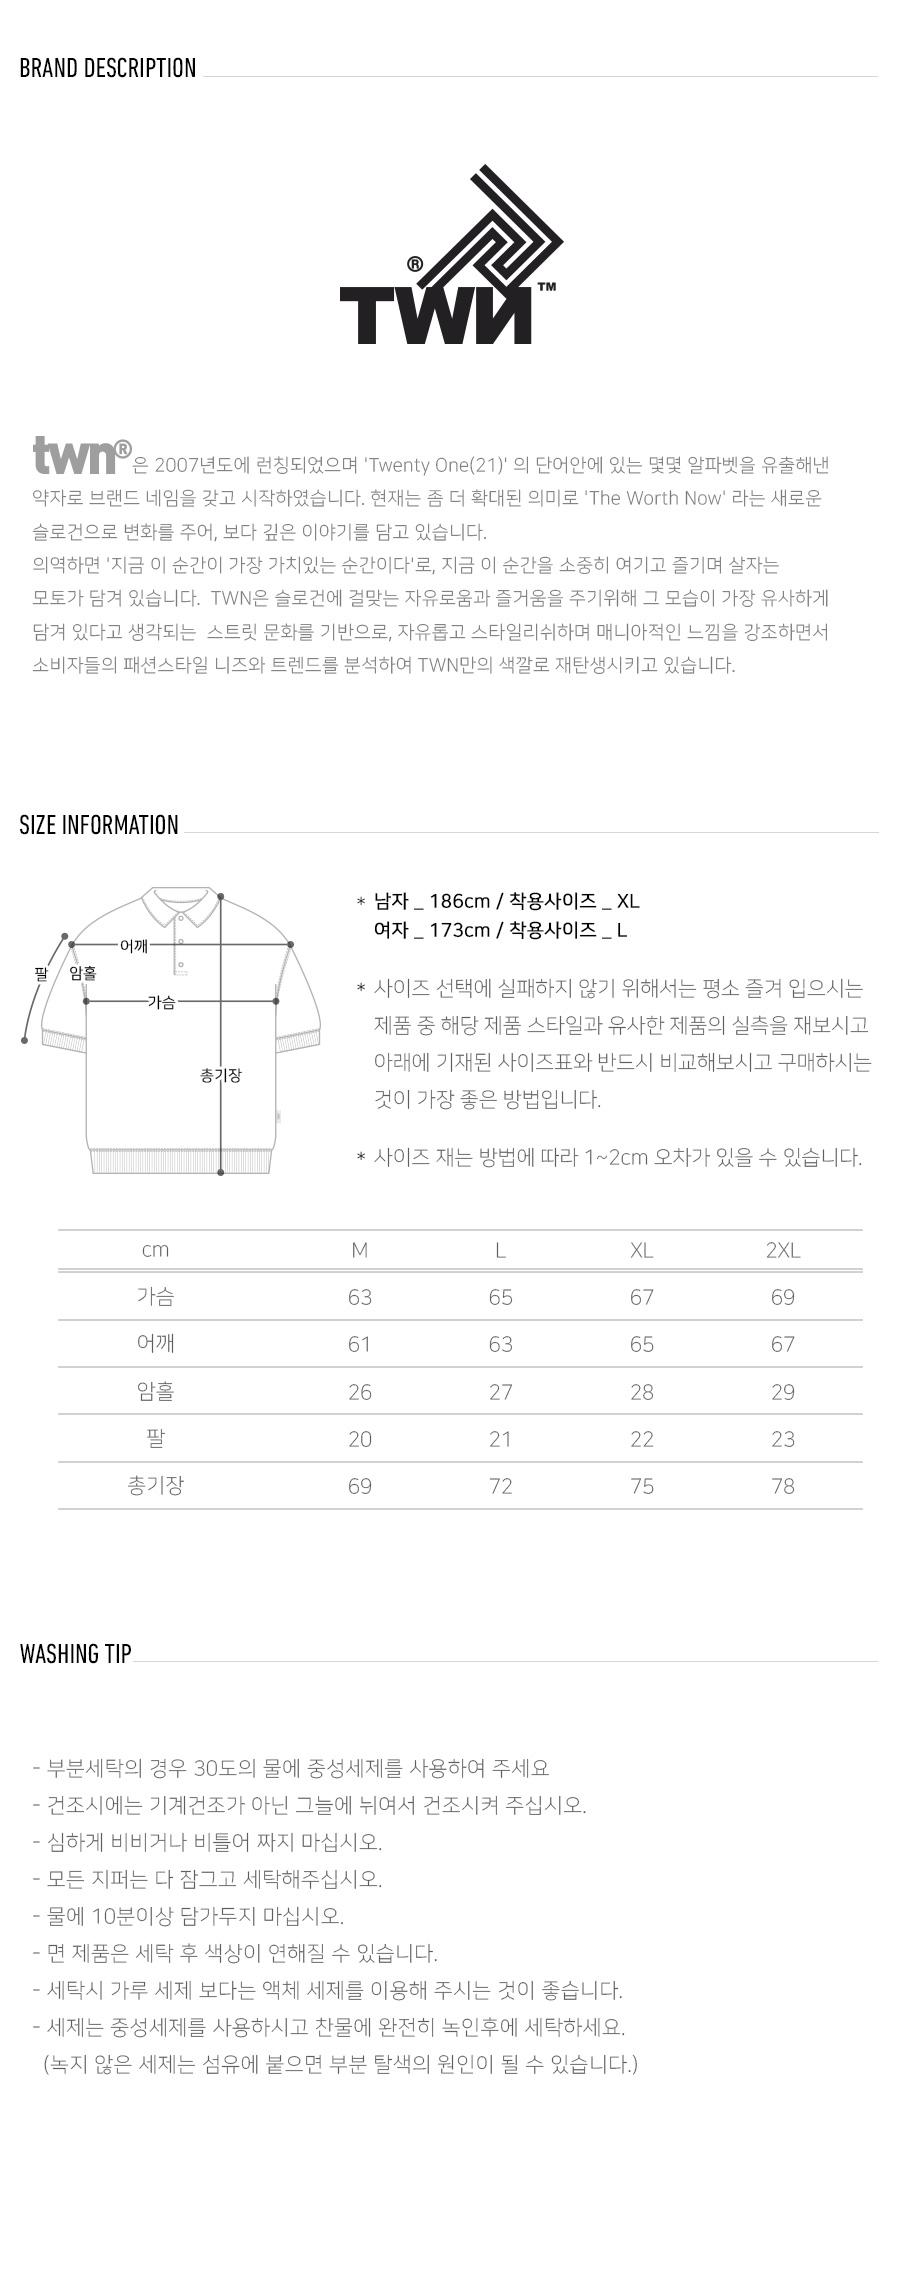 20200519_twn_volleyball_size.jpg